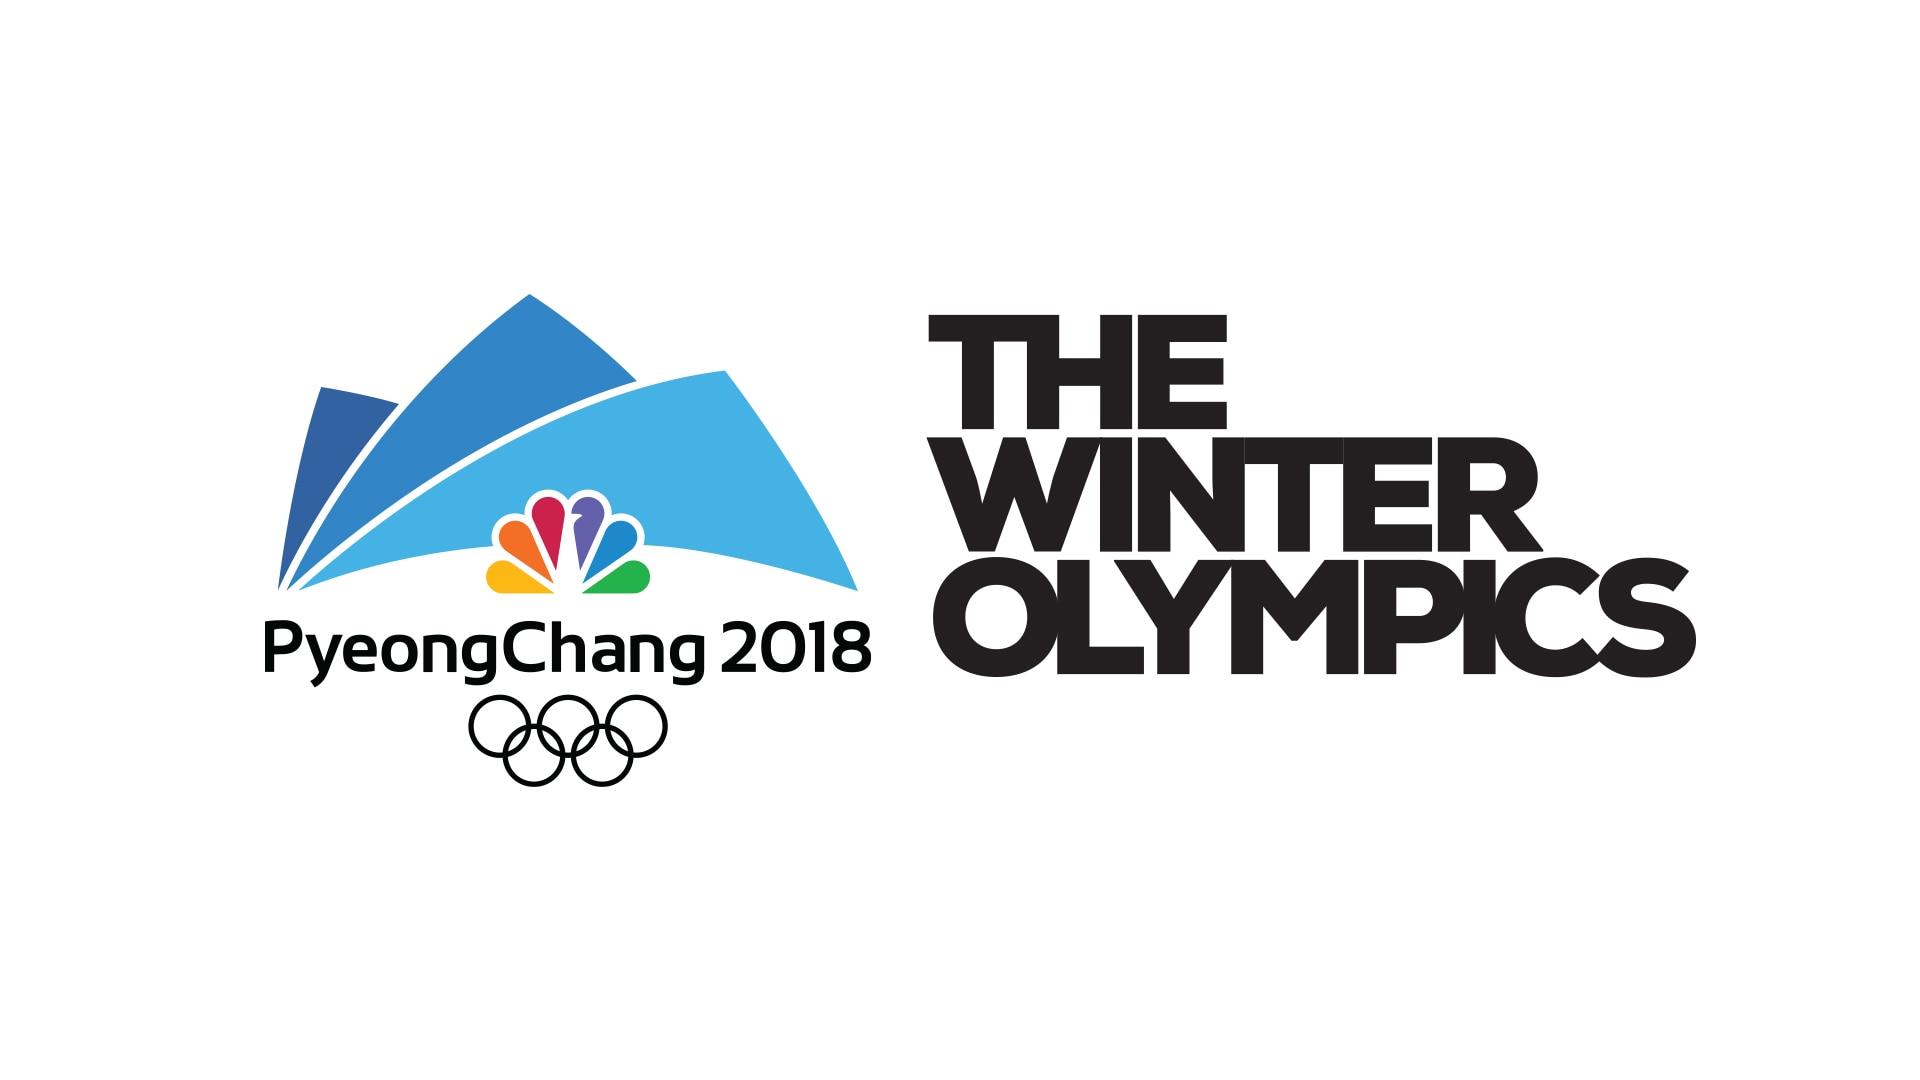 pyeongchang 2018 winter olympics - nbc - nbc